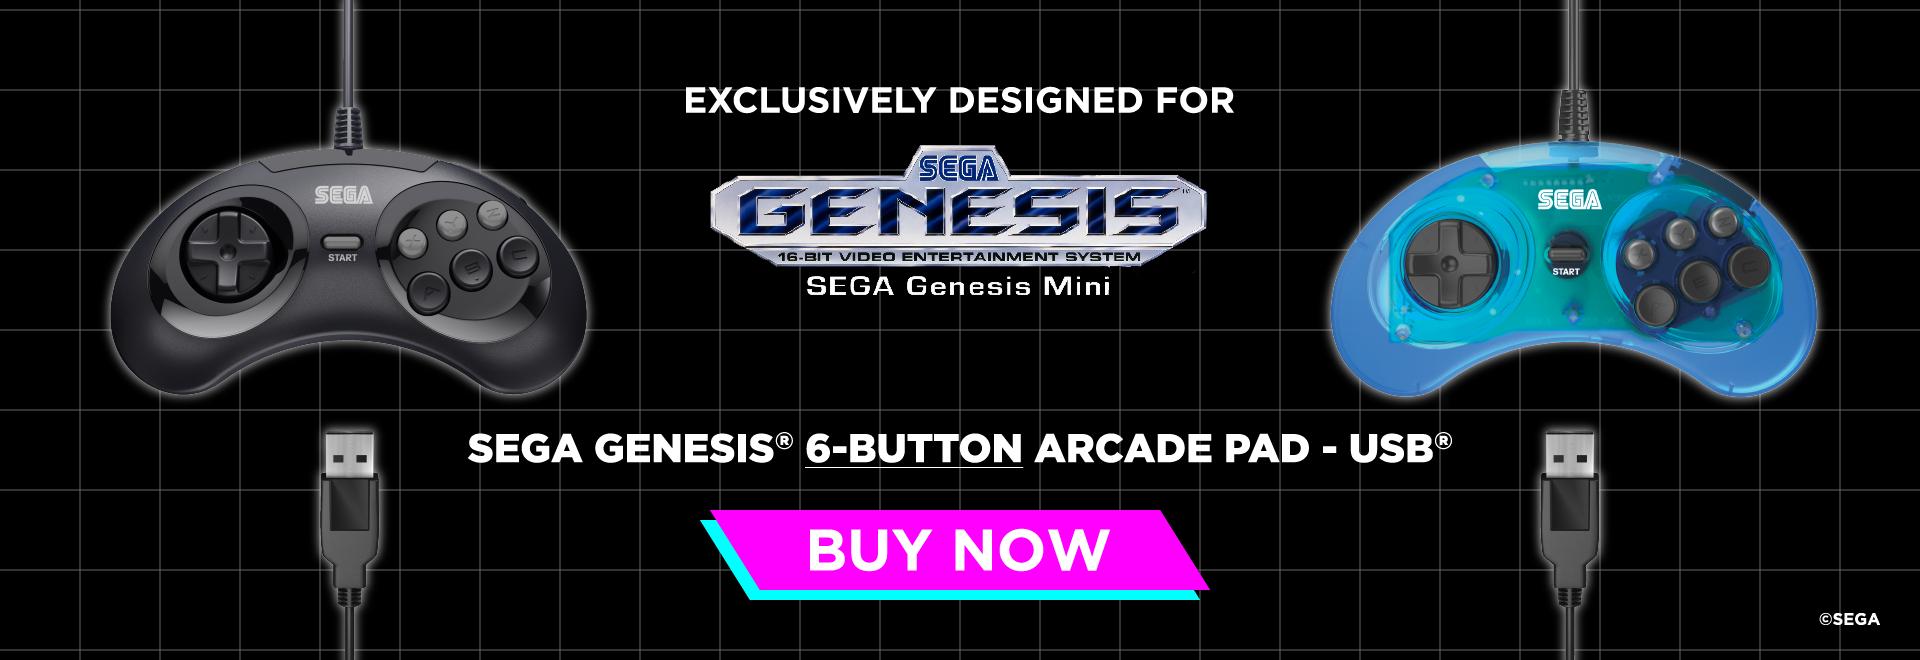 SEGA, Genesis, Mini, 6-Button, USB, Arcade Pad, Retro-Bit, Buy Now